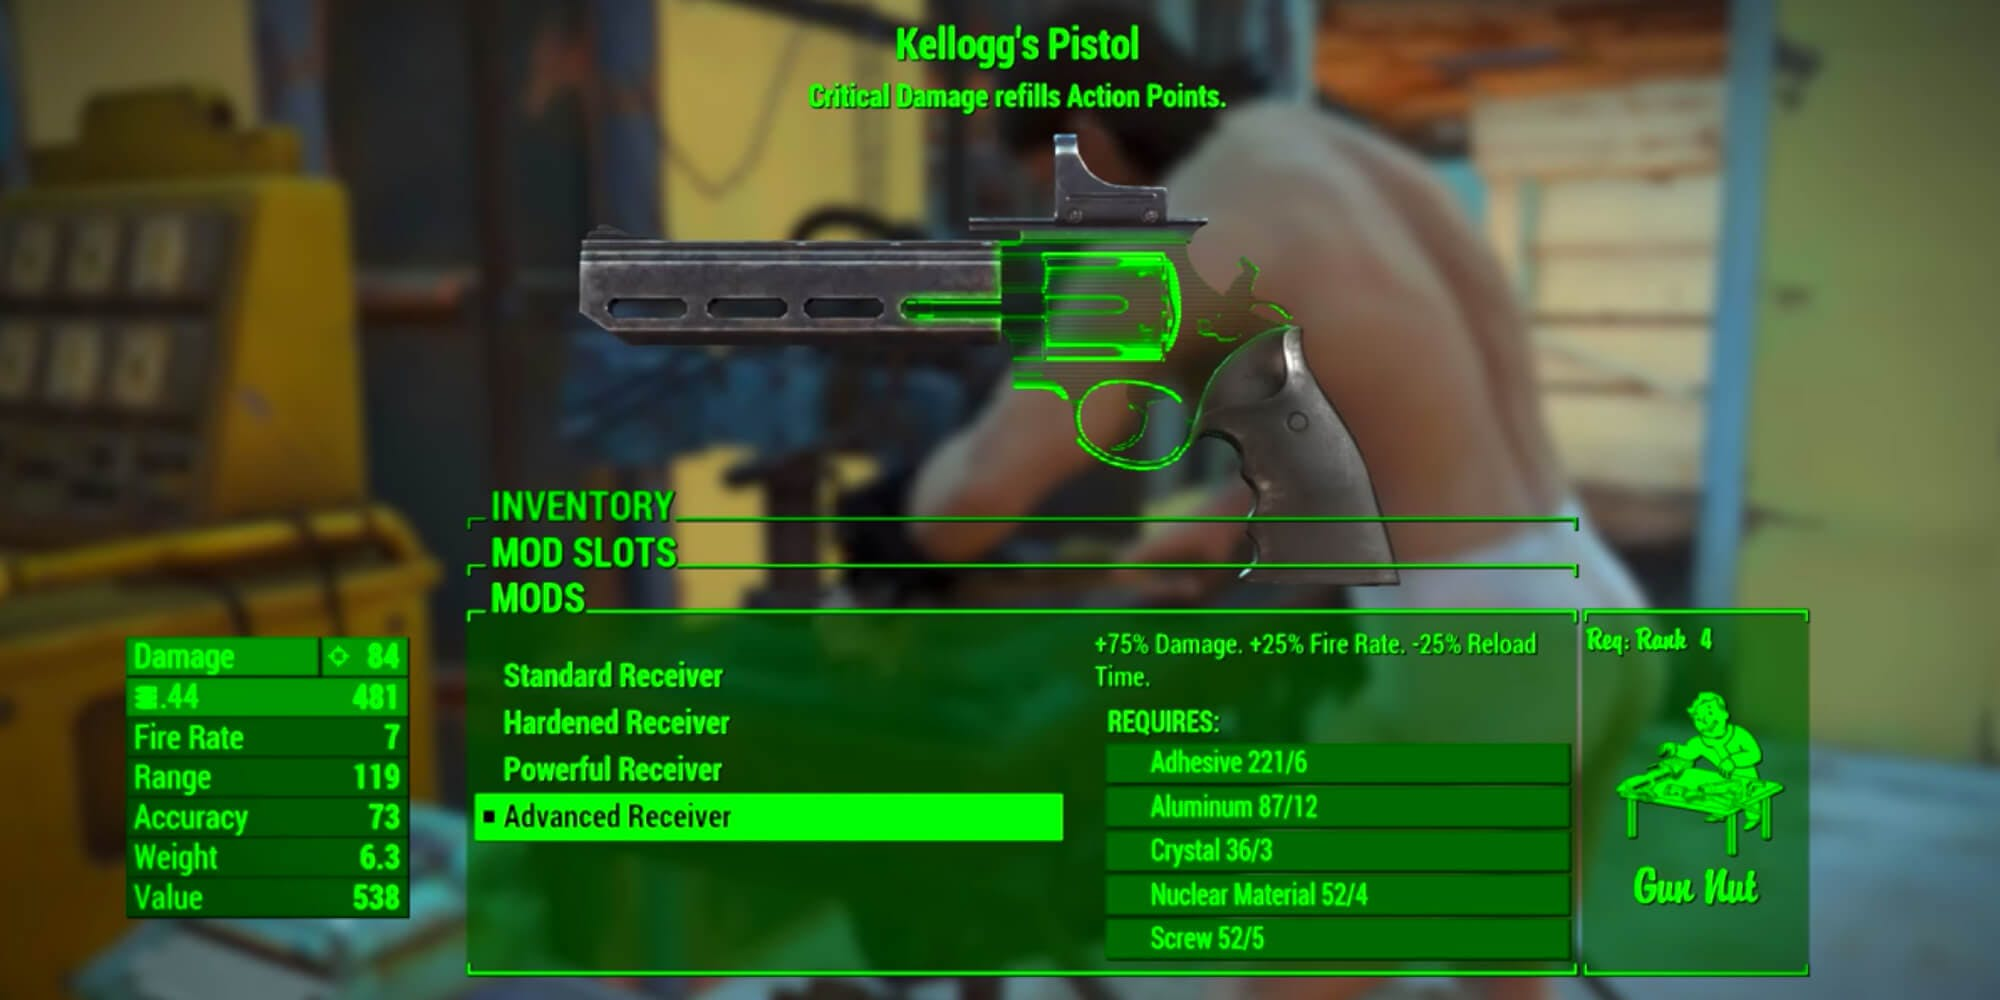 Fallout 4 weapons - Kellog's Pistol